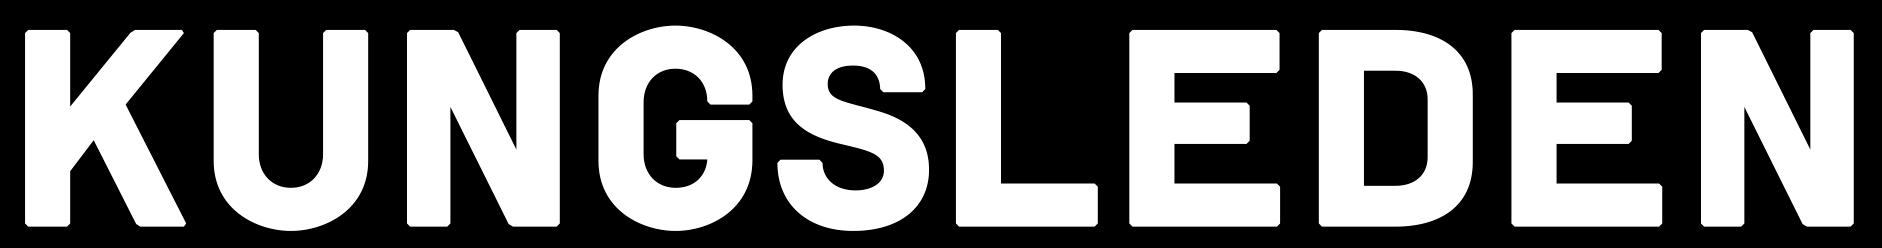 kungsleden vit-logotyp